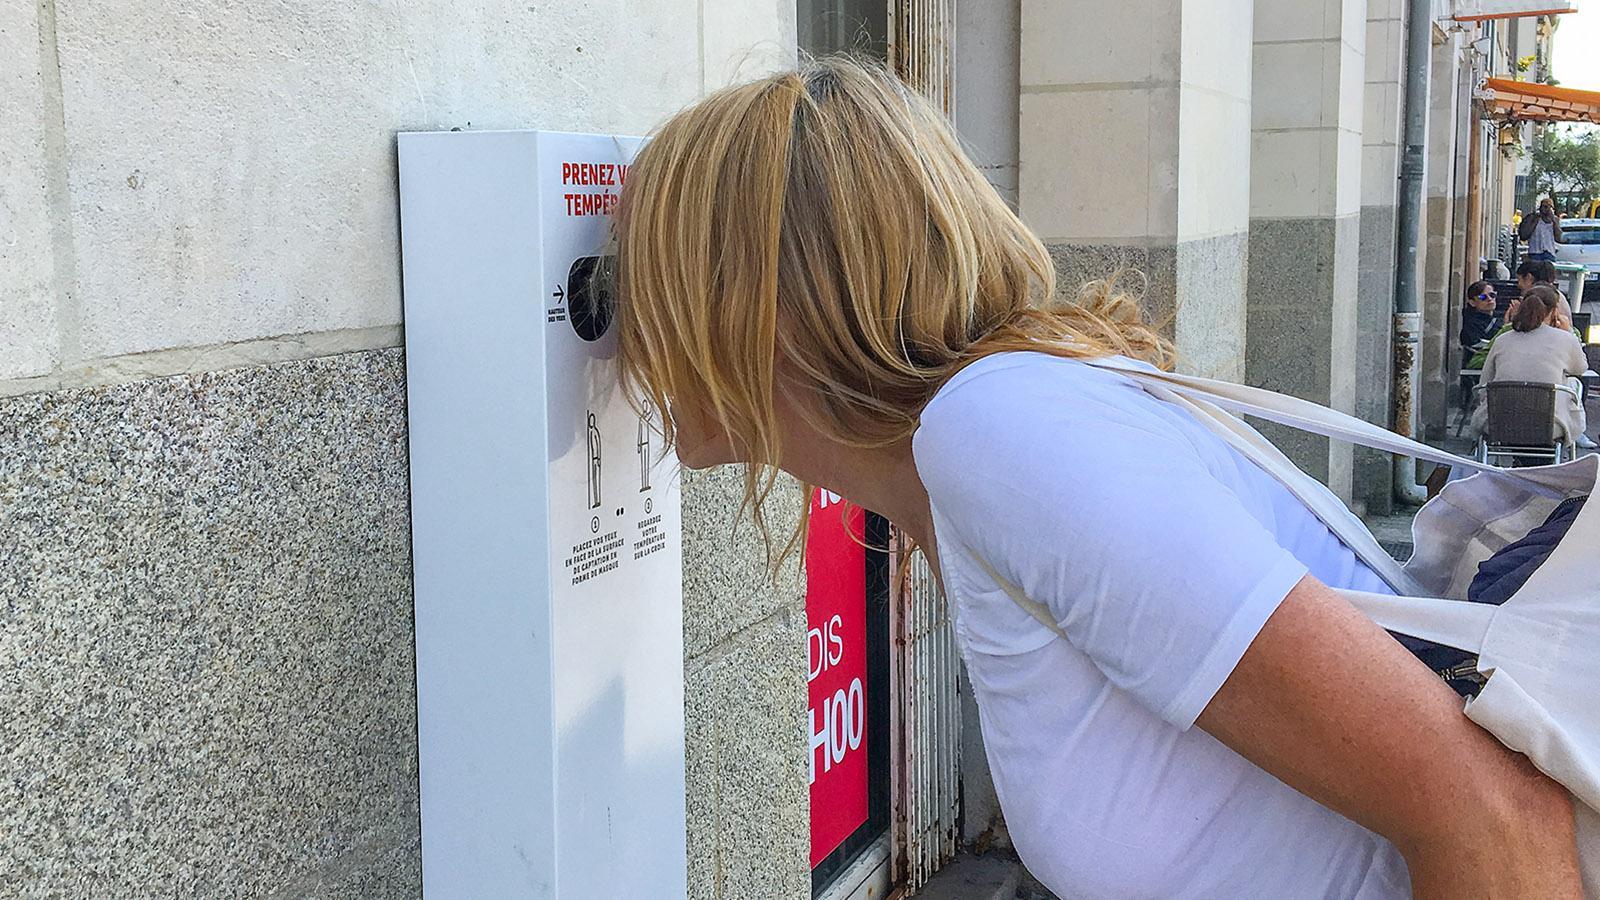 Voyage à Nantes: Pharmacie-Projekt Temperaturmessung. Foto: Hilke Maunder